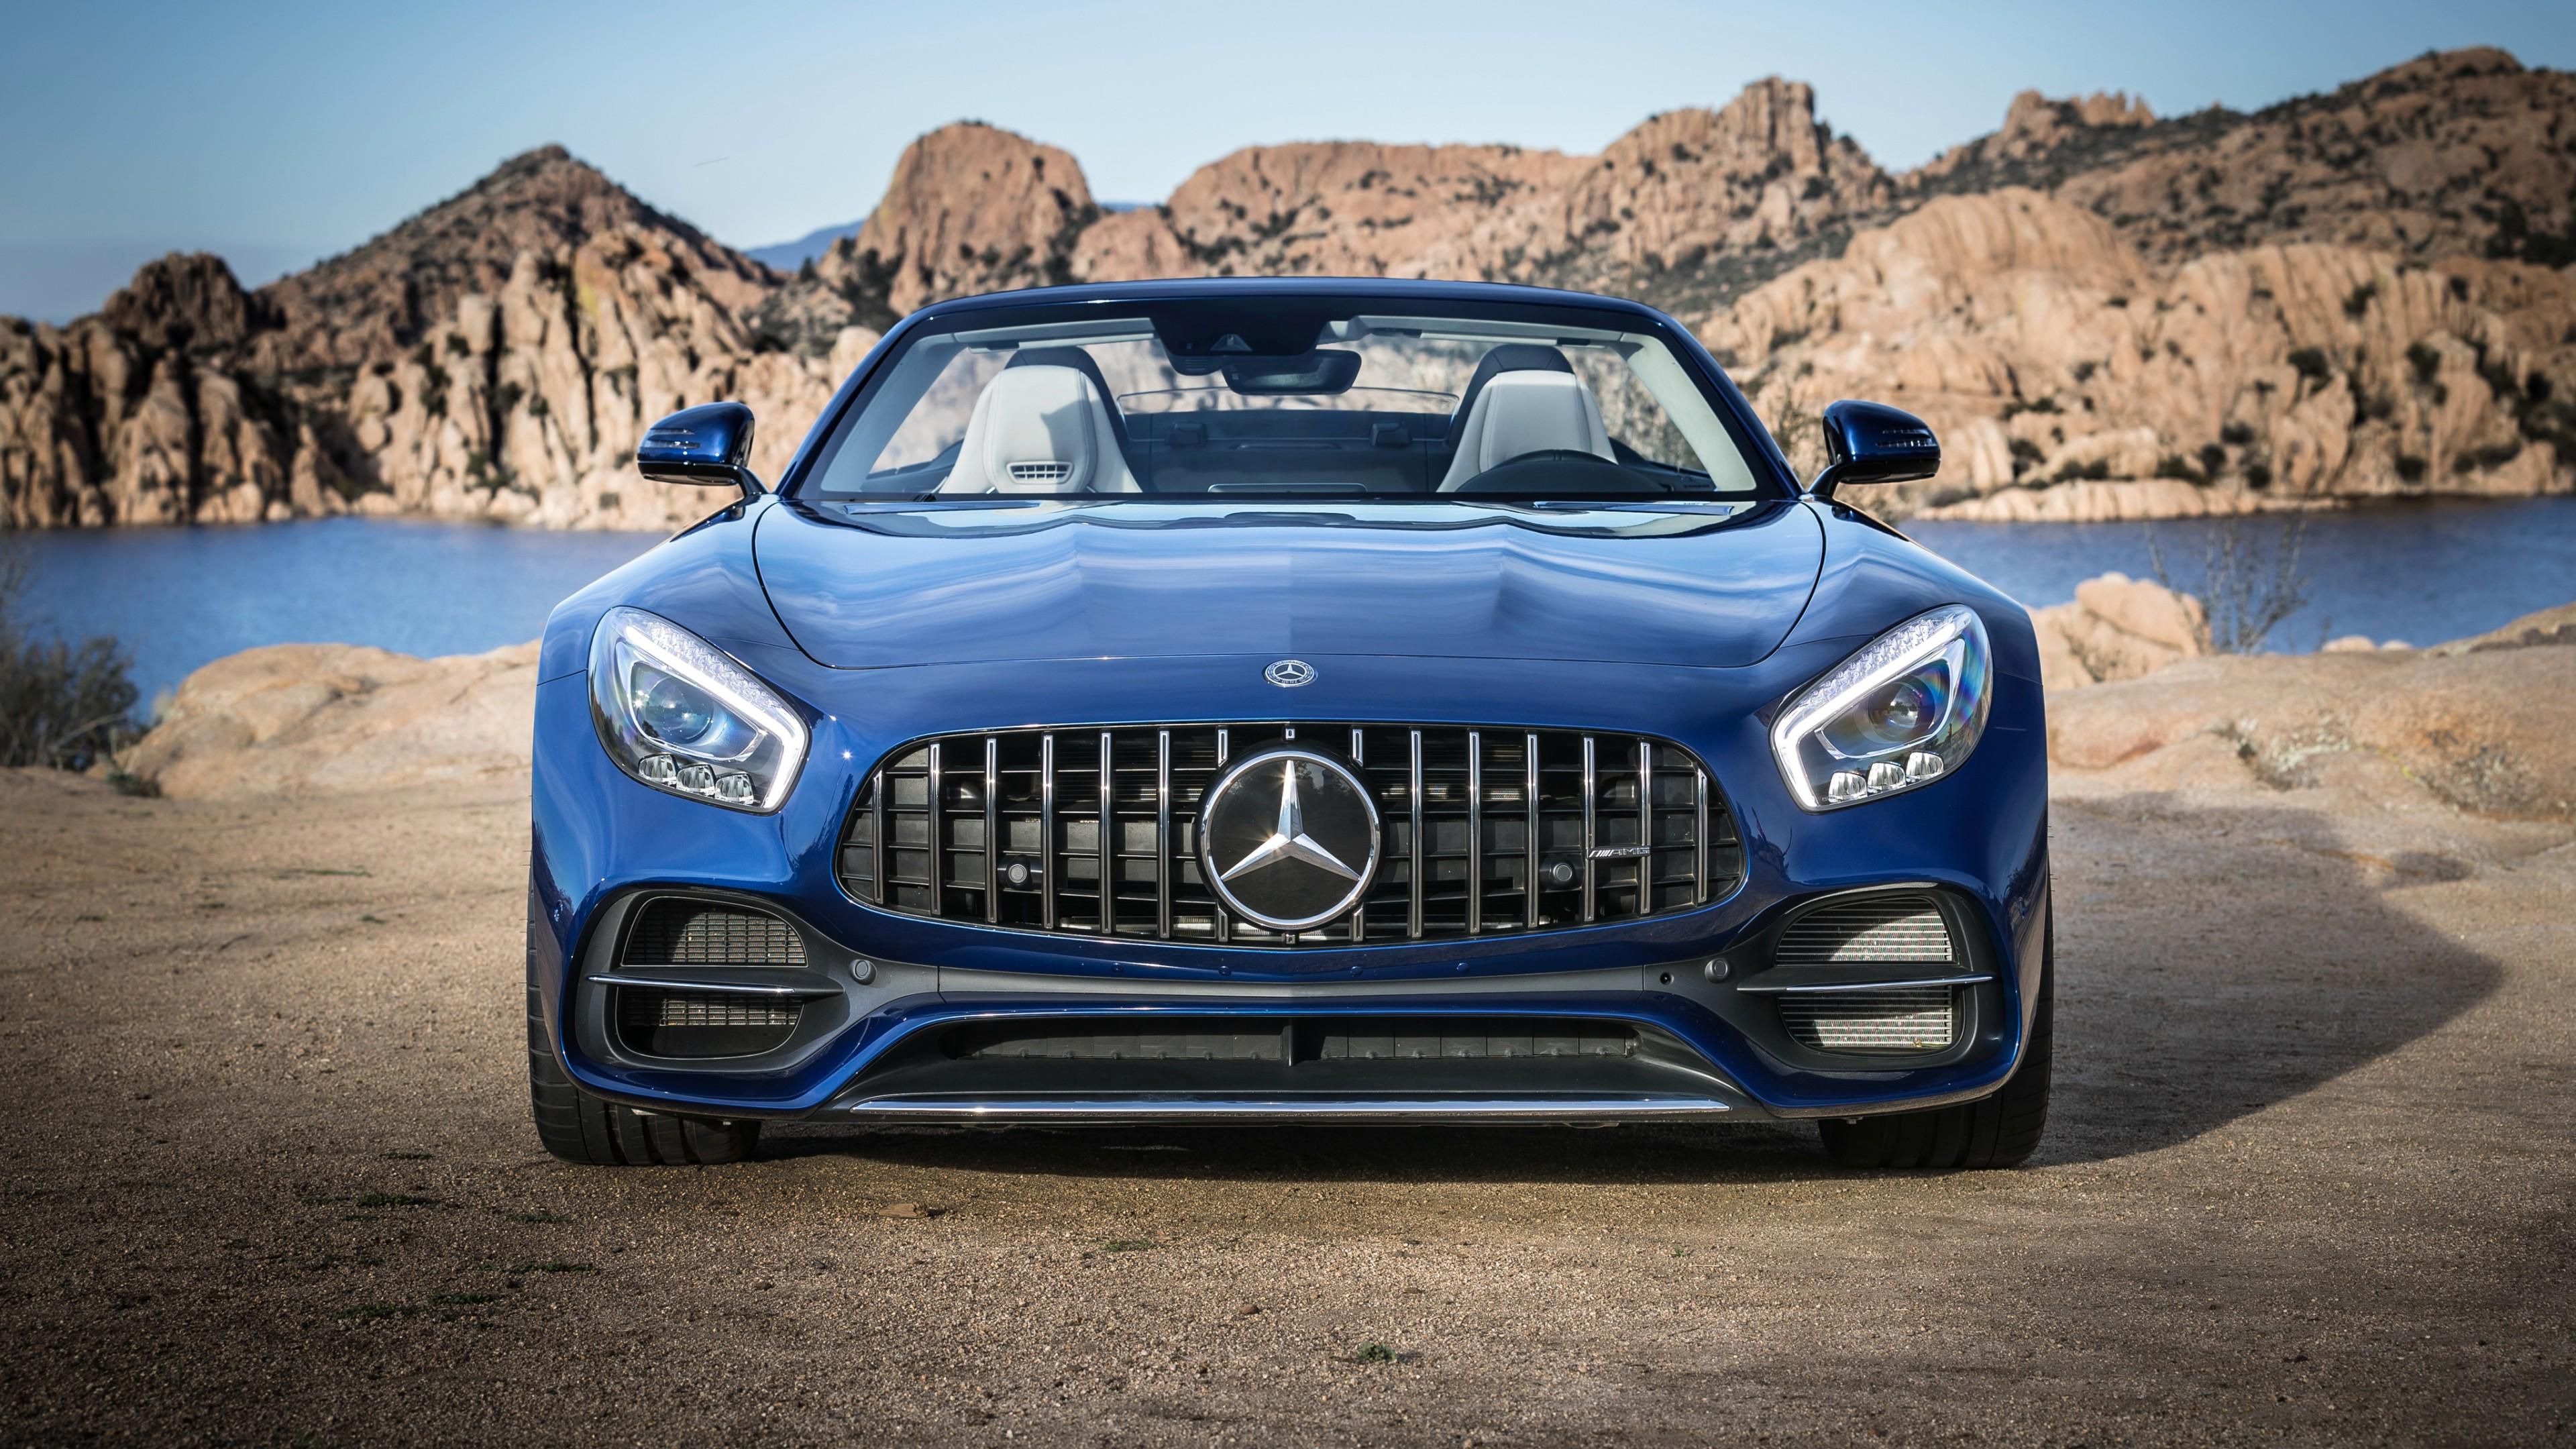 2018 Mercedes Amg Gt Roadster Wallpaper Hd Car Wallpapers Id 7727